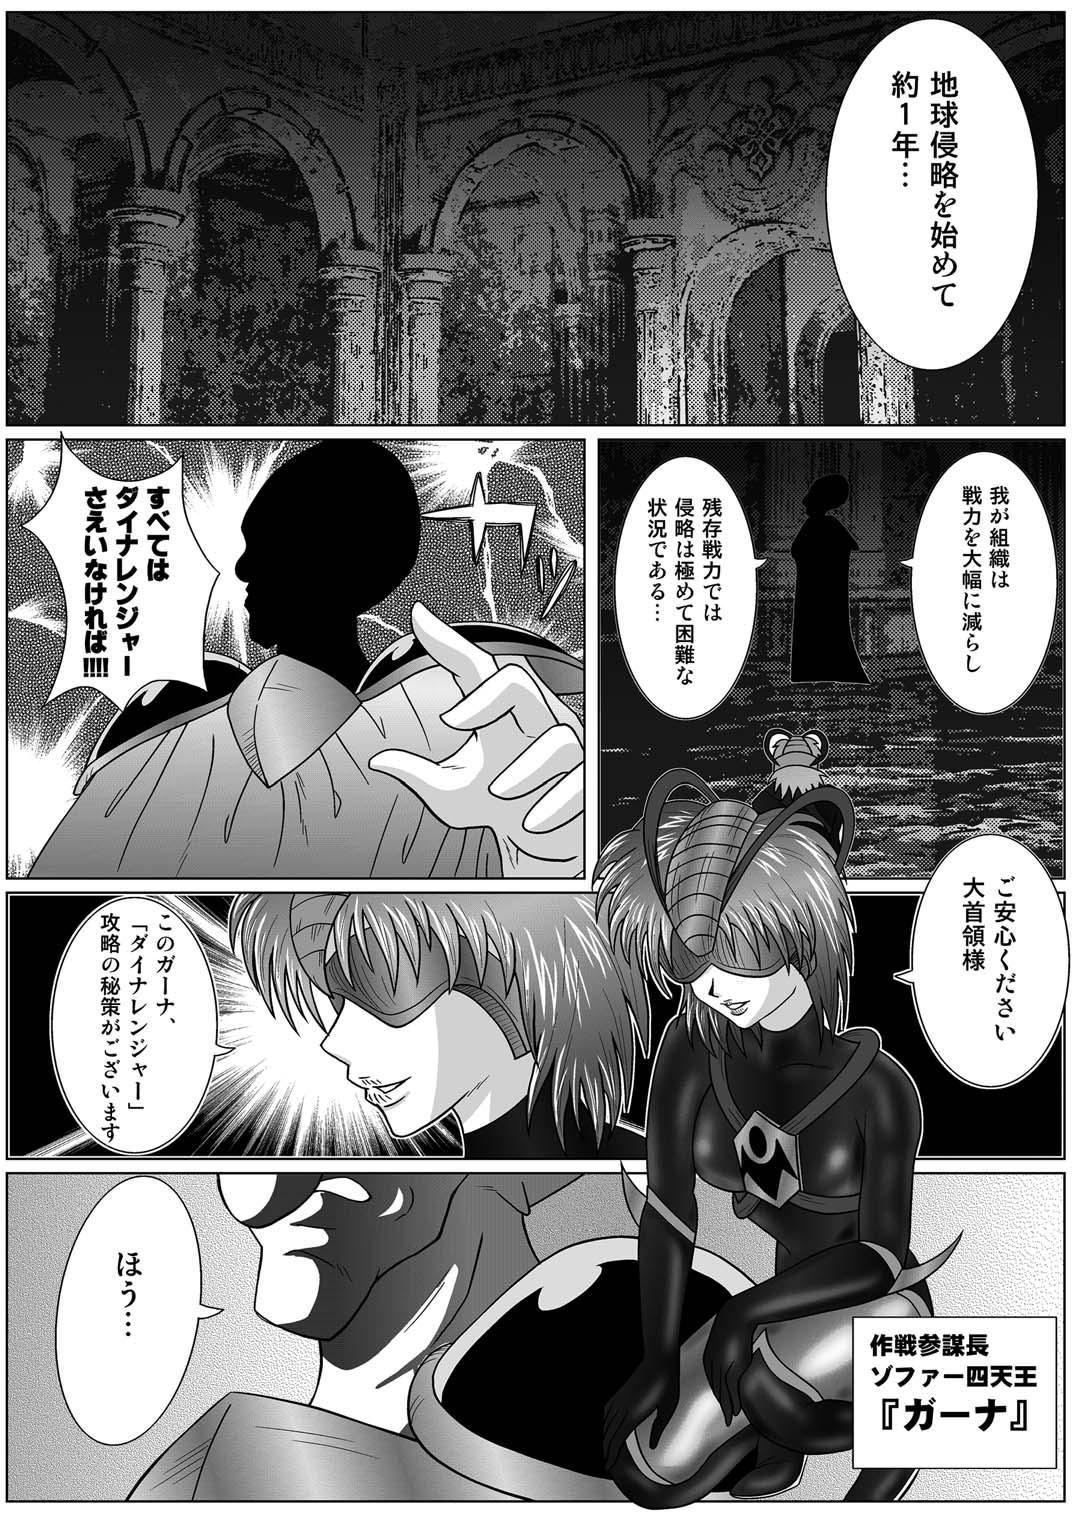 [Macxe's (monmon)] Tokubousentai Dinaranger ~Heroine Kairaku Sennou Keikaku~ Vol.01/02/03 (Renkaban) [Digital] 5